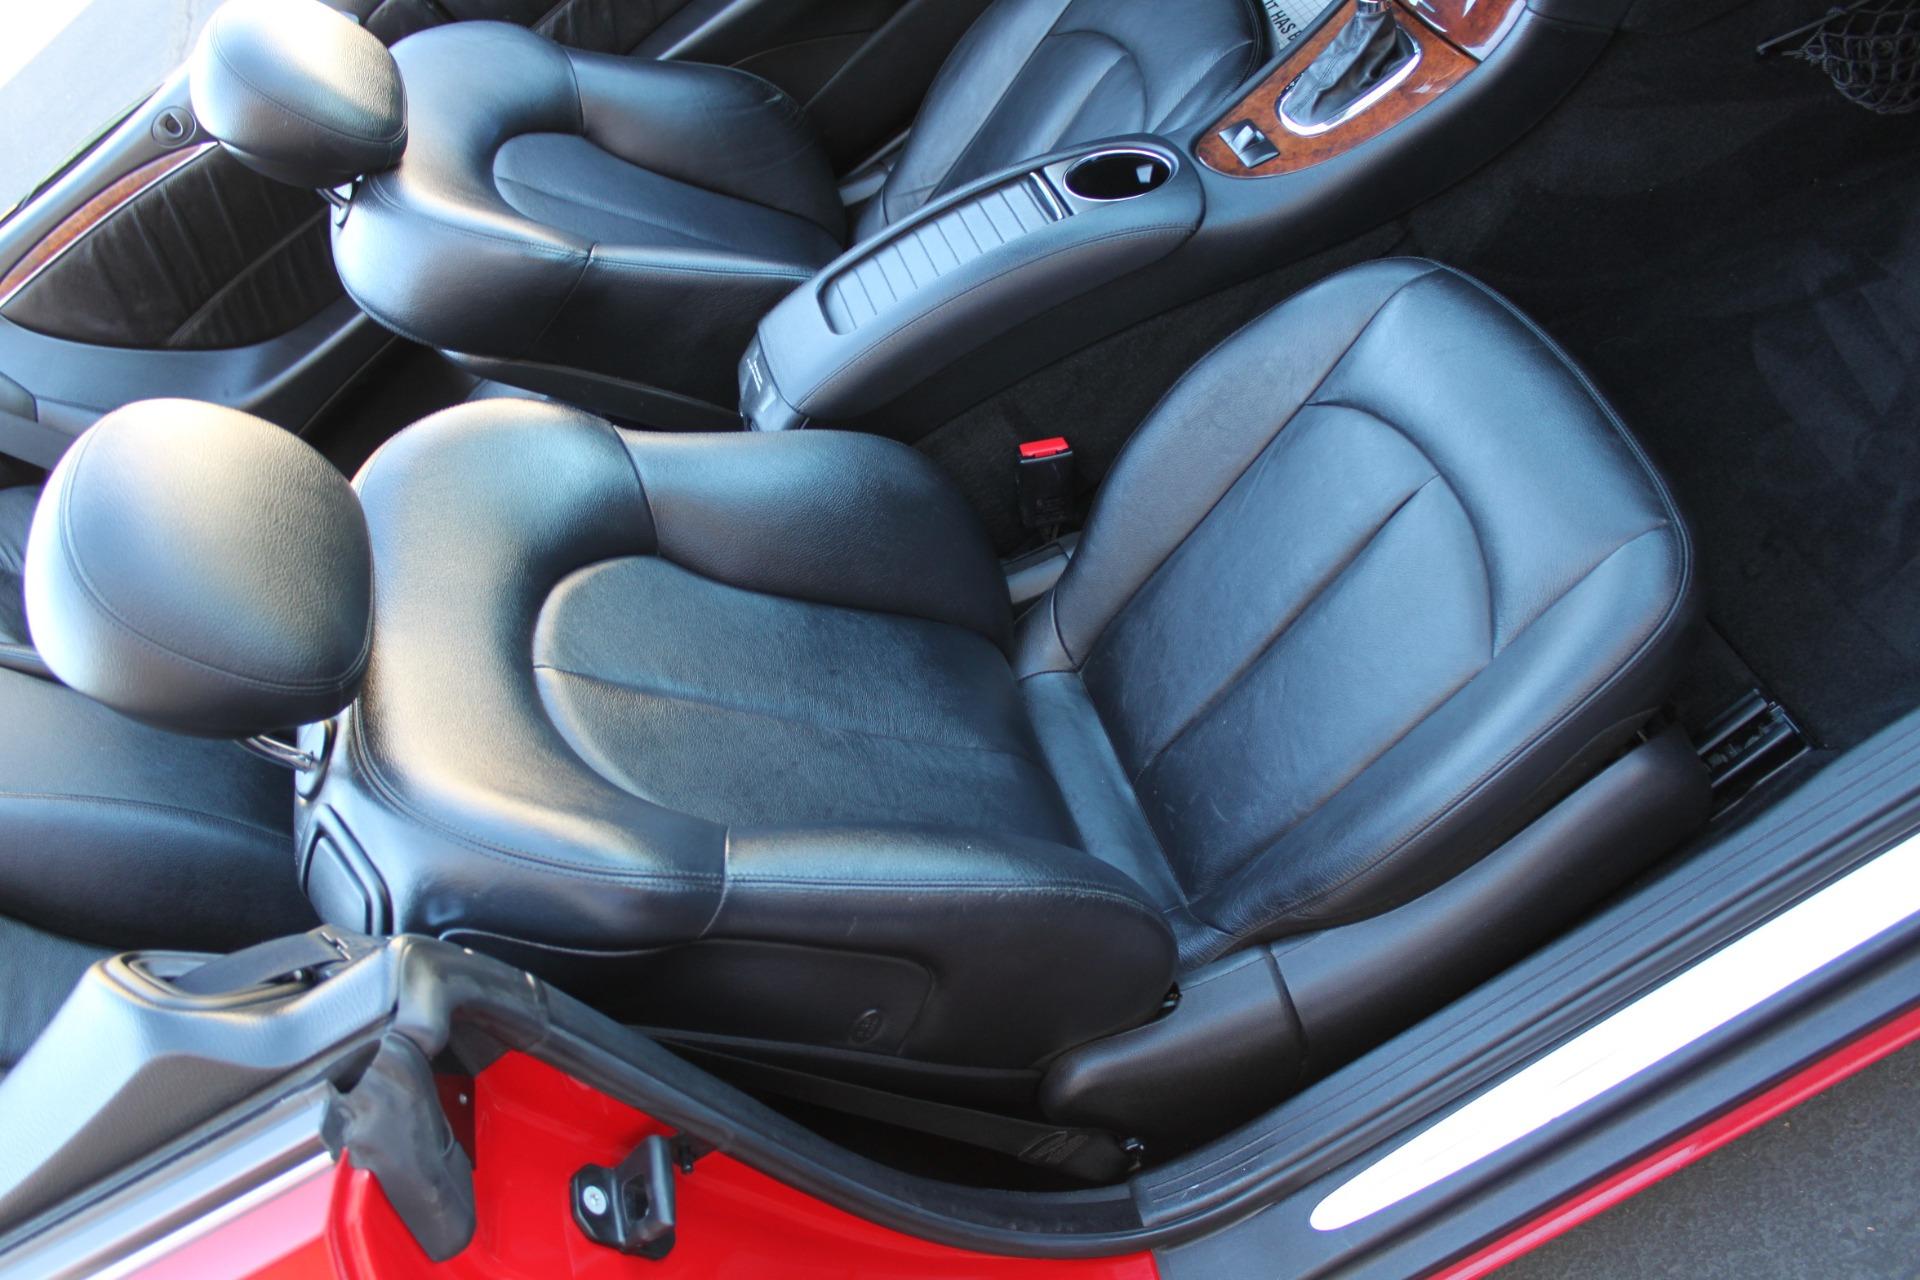 Used-2006-Mercedes-Benz-CLK-Class-CLK350-Cabriolet-35L-BMW